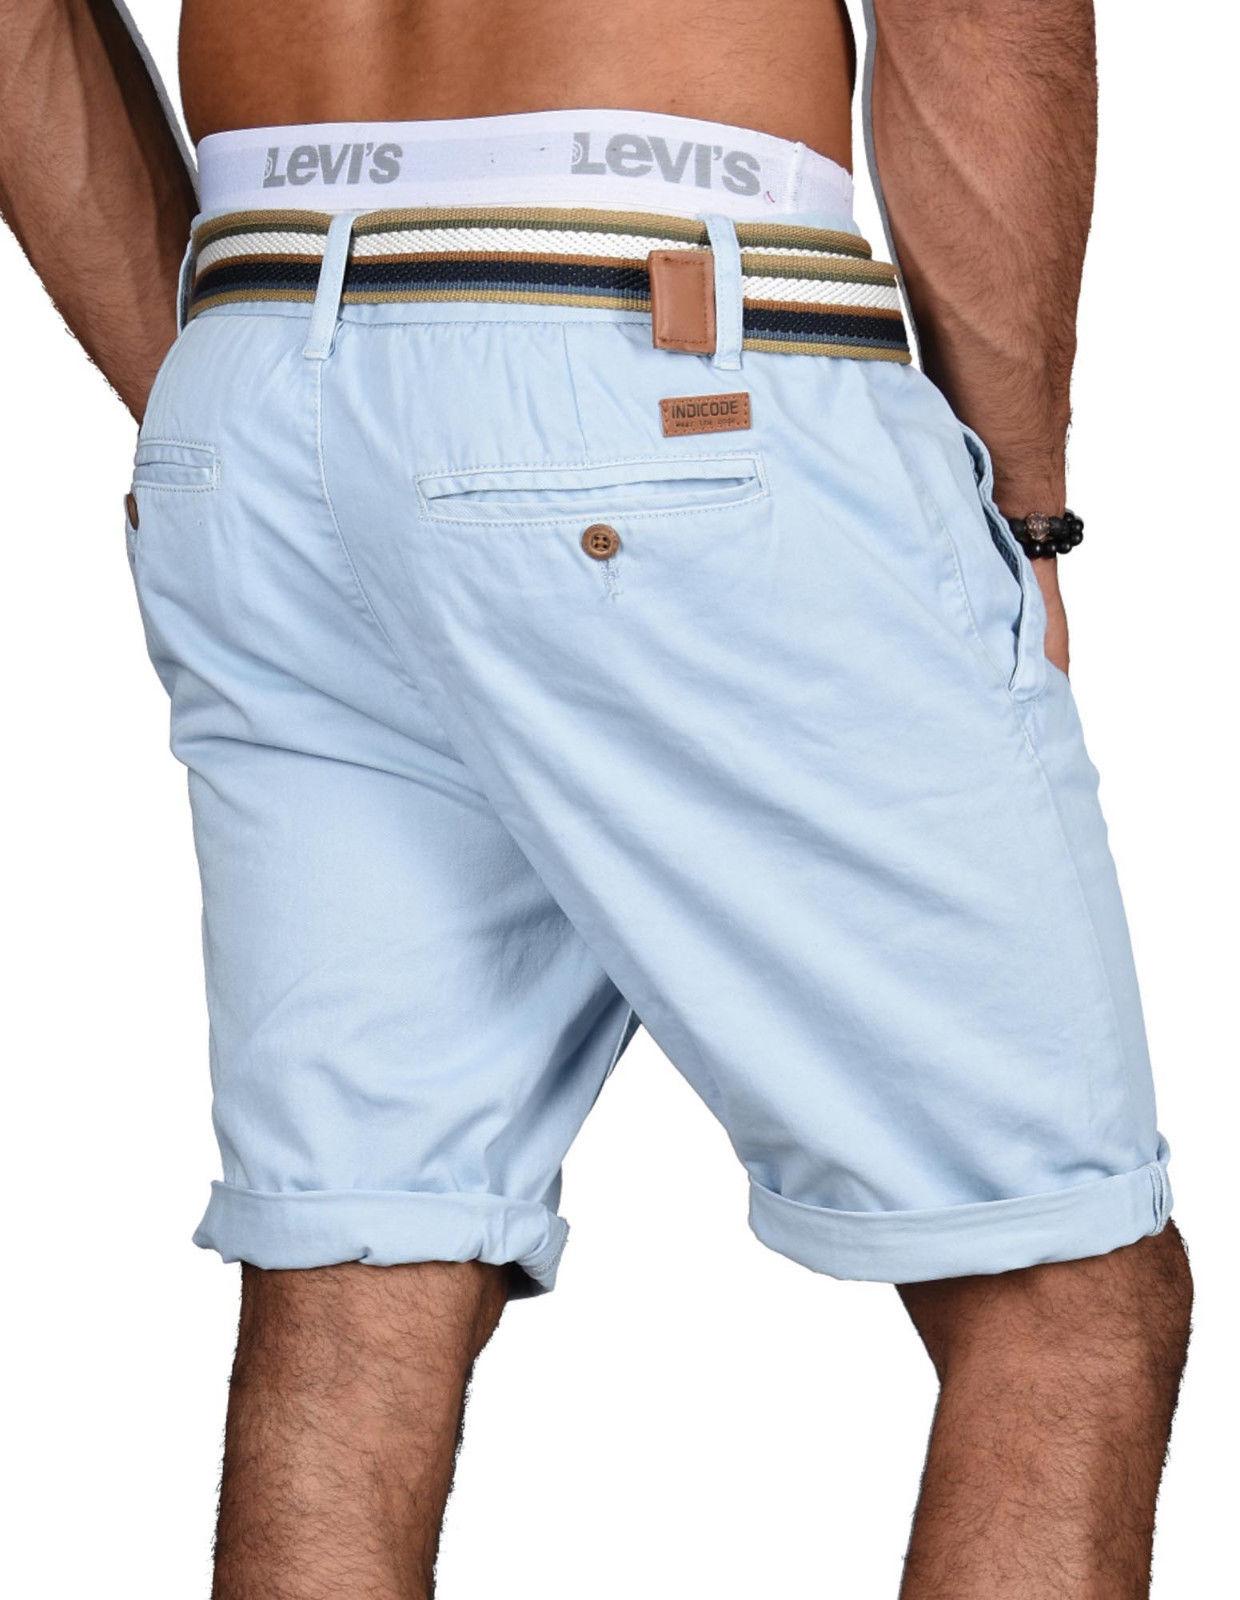 Indicode-Herren-Sommer-Bermuda-Chino-Shorts-kurze-Hose-Sommerhose-Short-NEU-B499 Indexbild 12